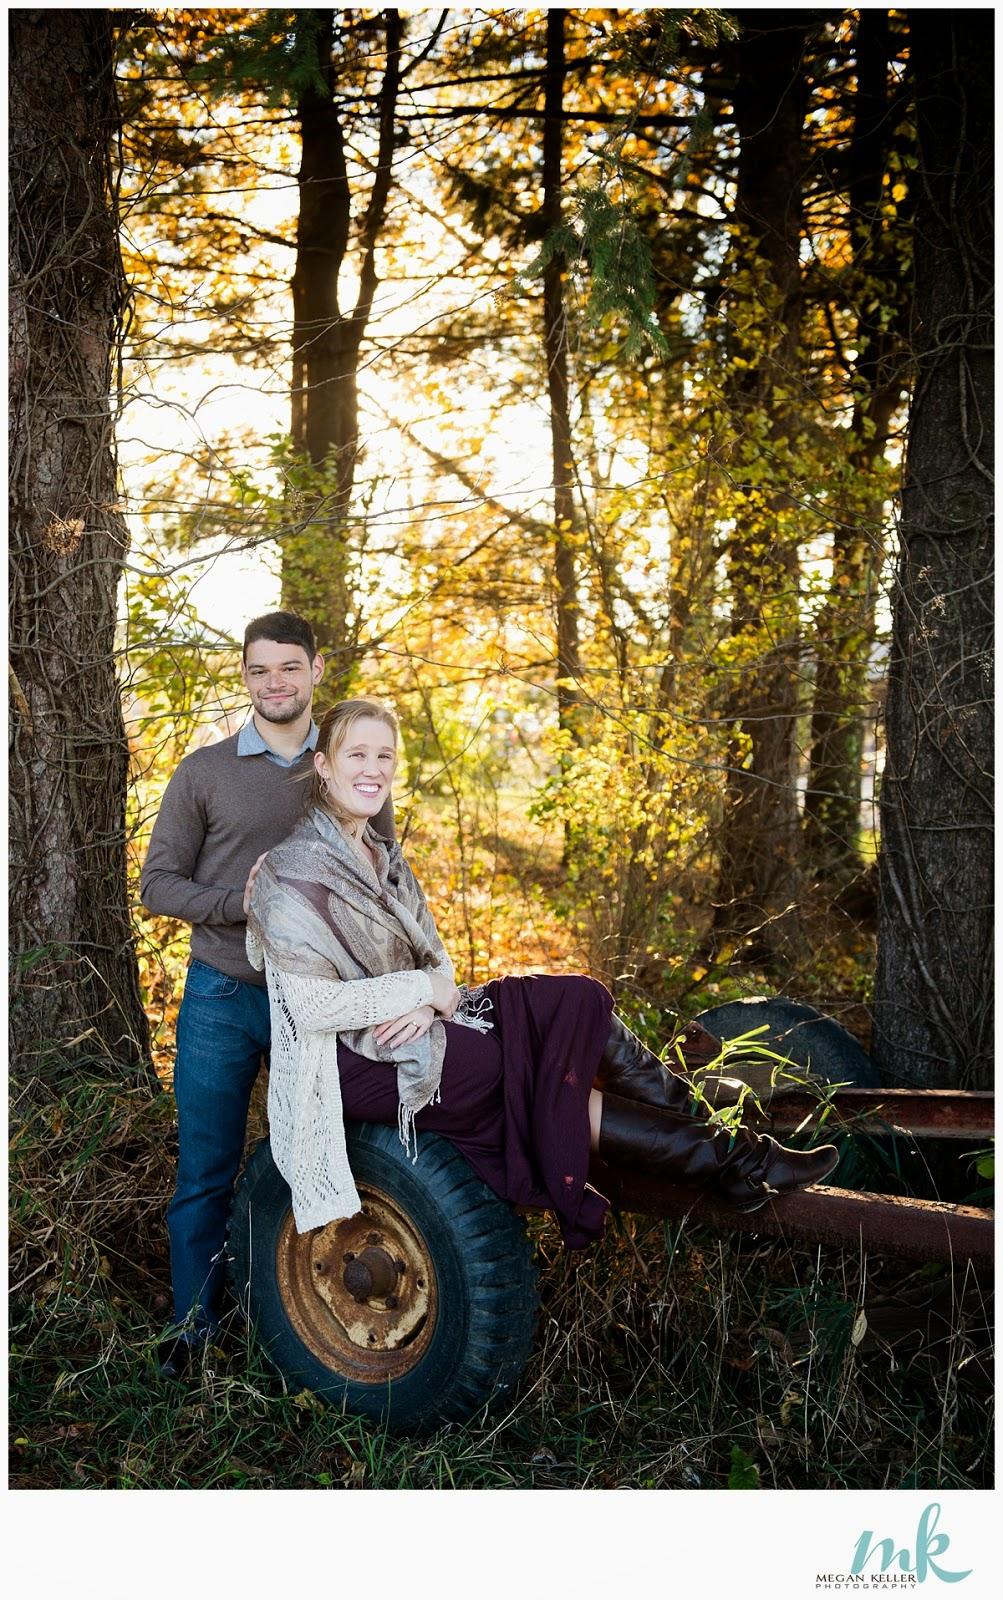 Bethany and Eli's Engagement Bethany and Eli's Engagement 2014 10 28 0009